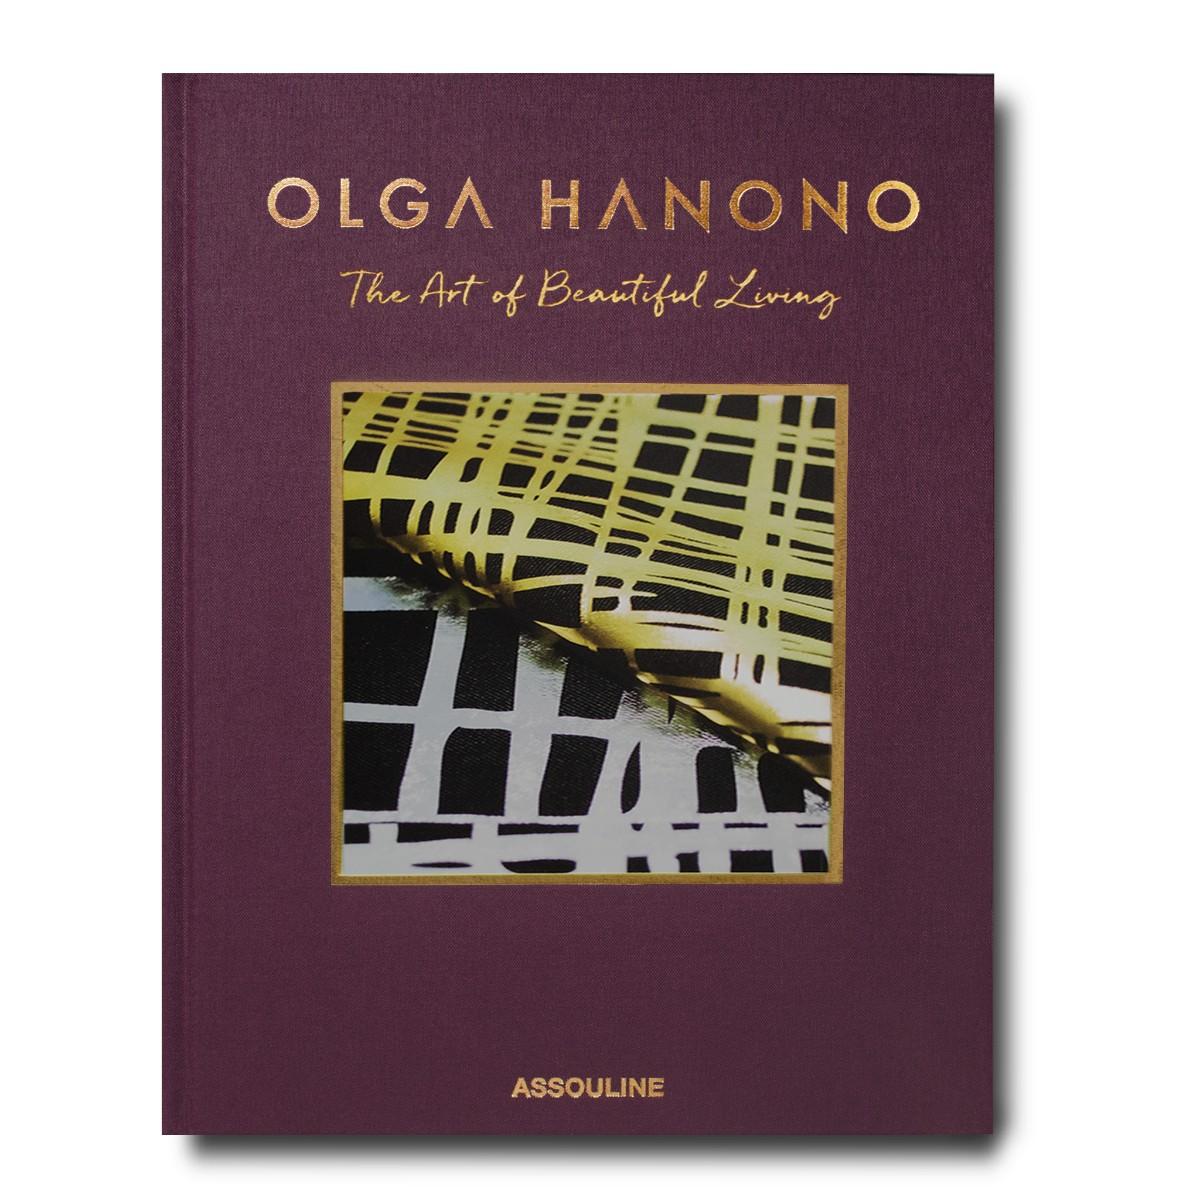 Assouline I Olga Hanono: The Art Of Beautiful Living